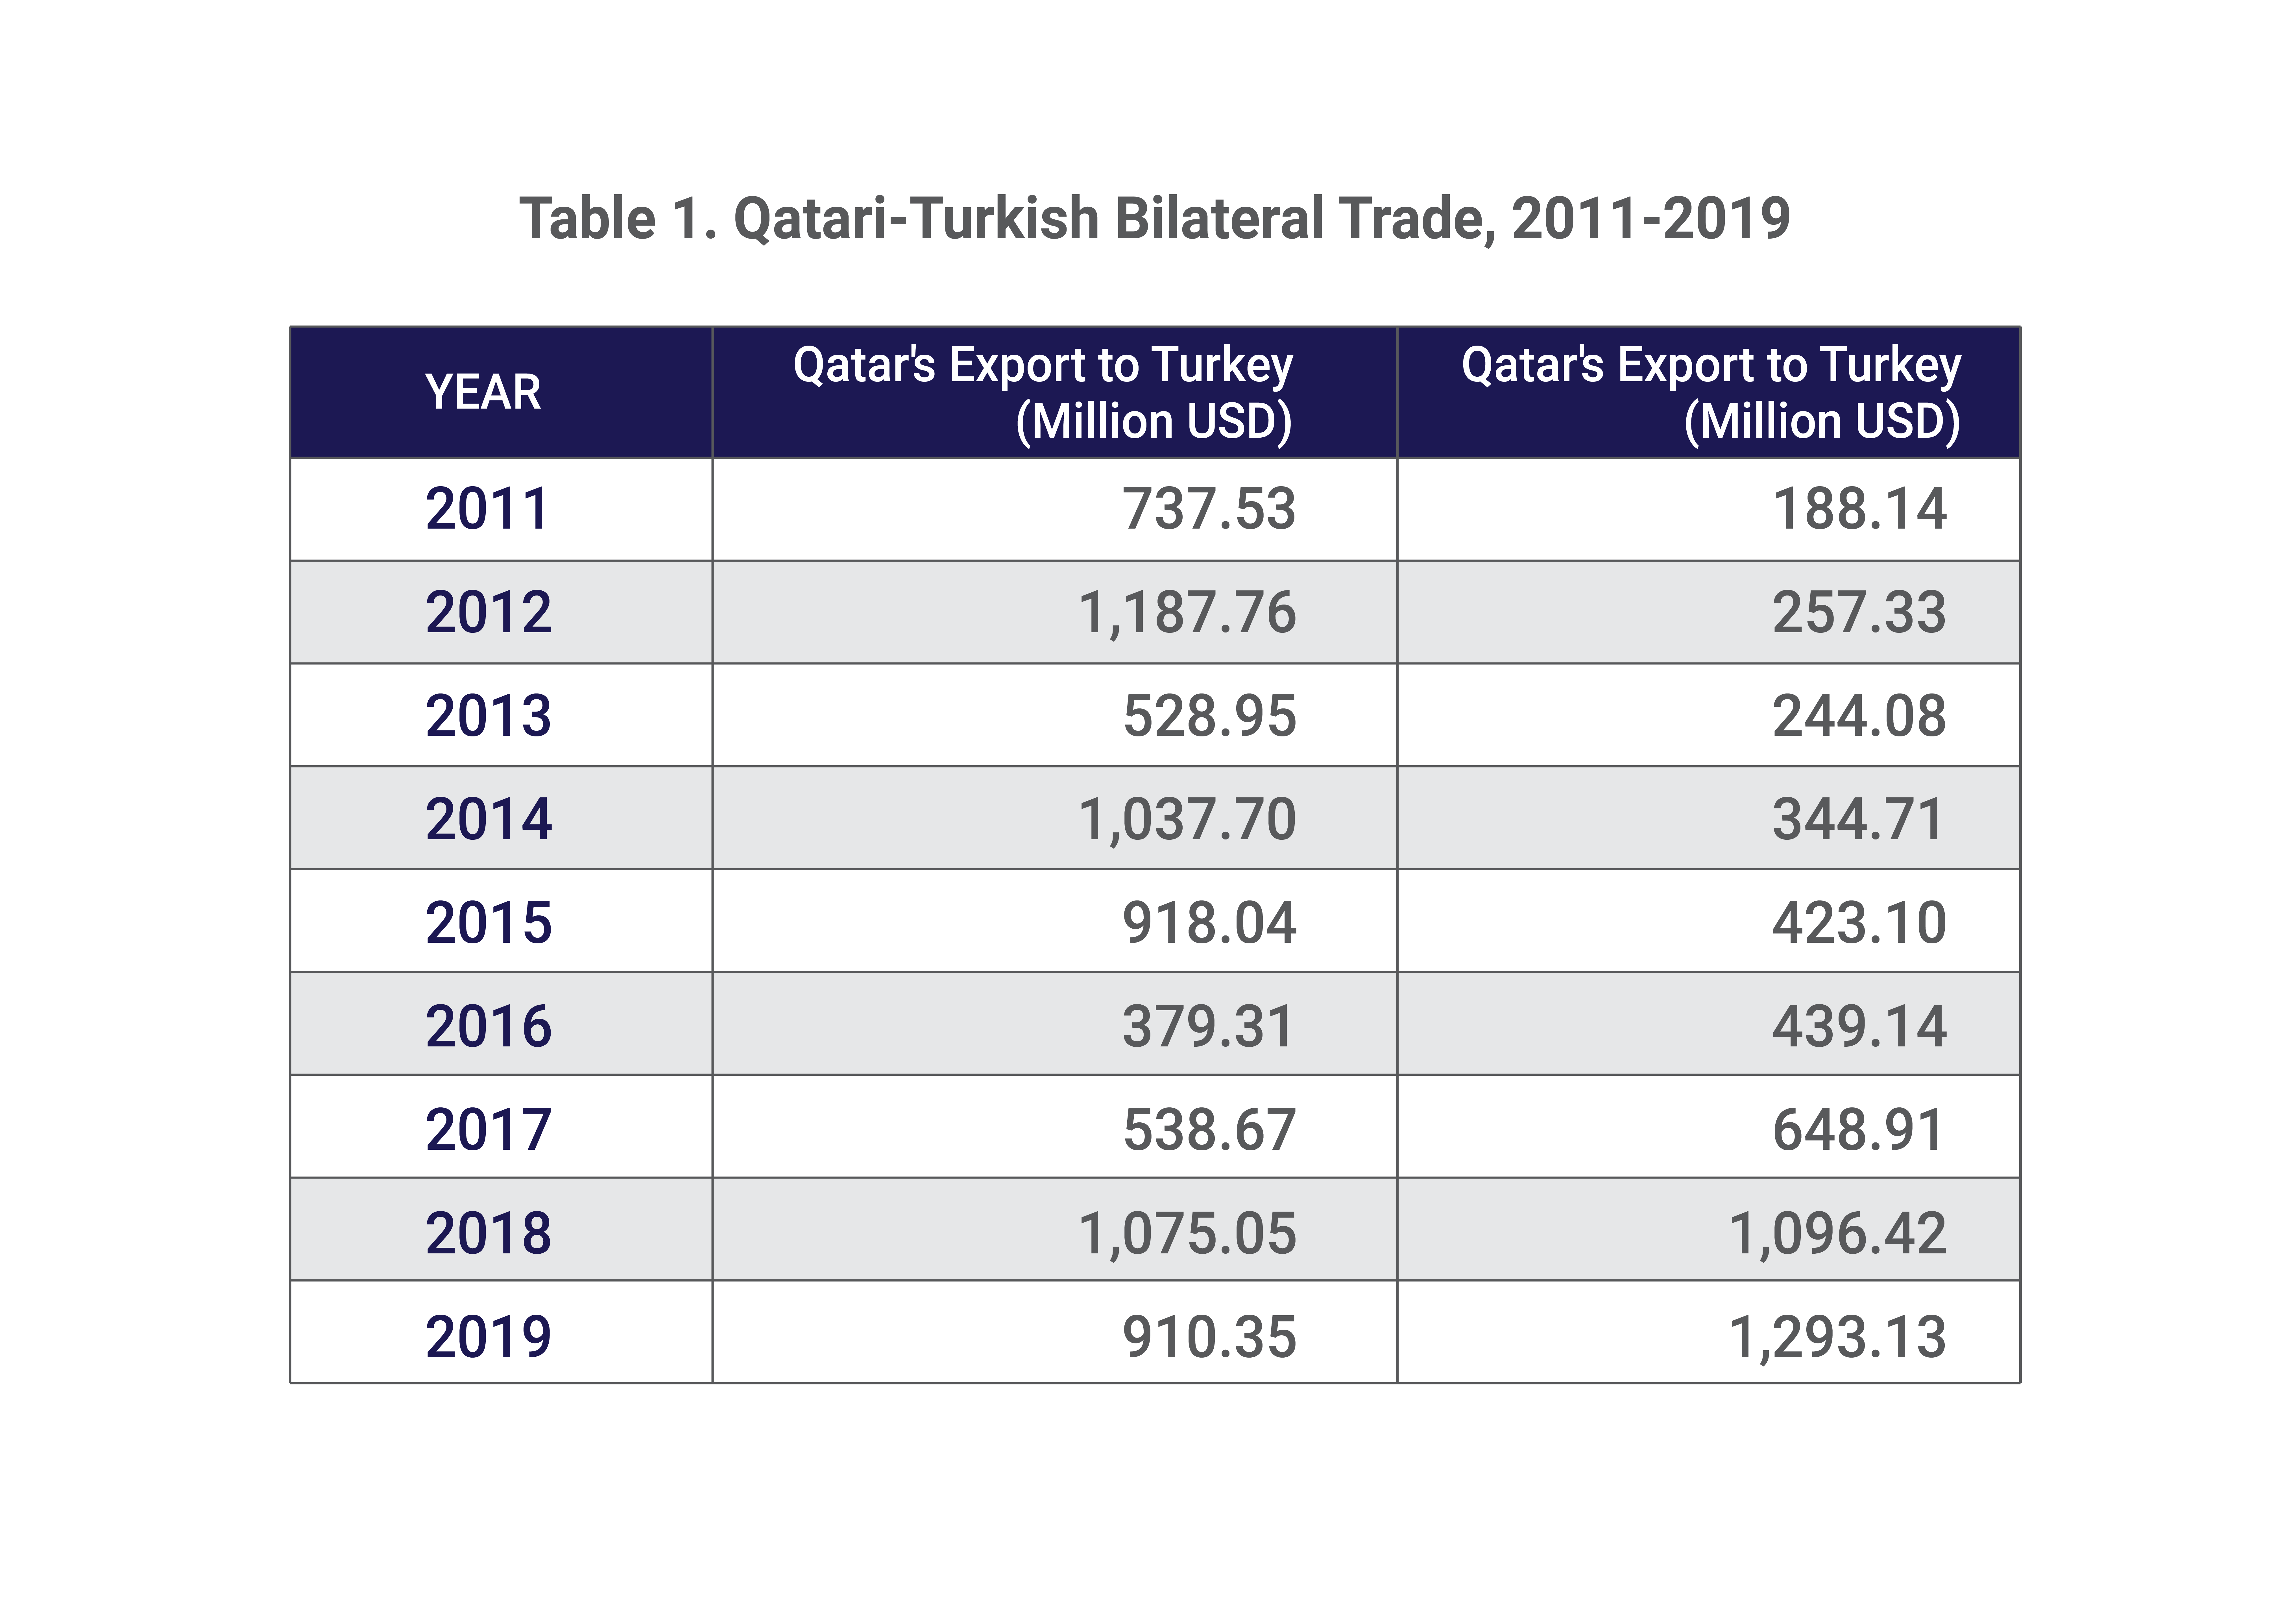 Table 1. Qatari-Turkish Bilateral Trade, 2011-2019